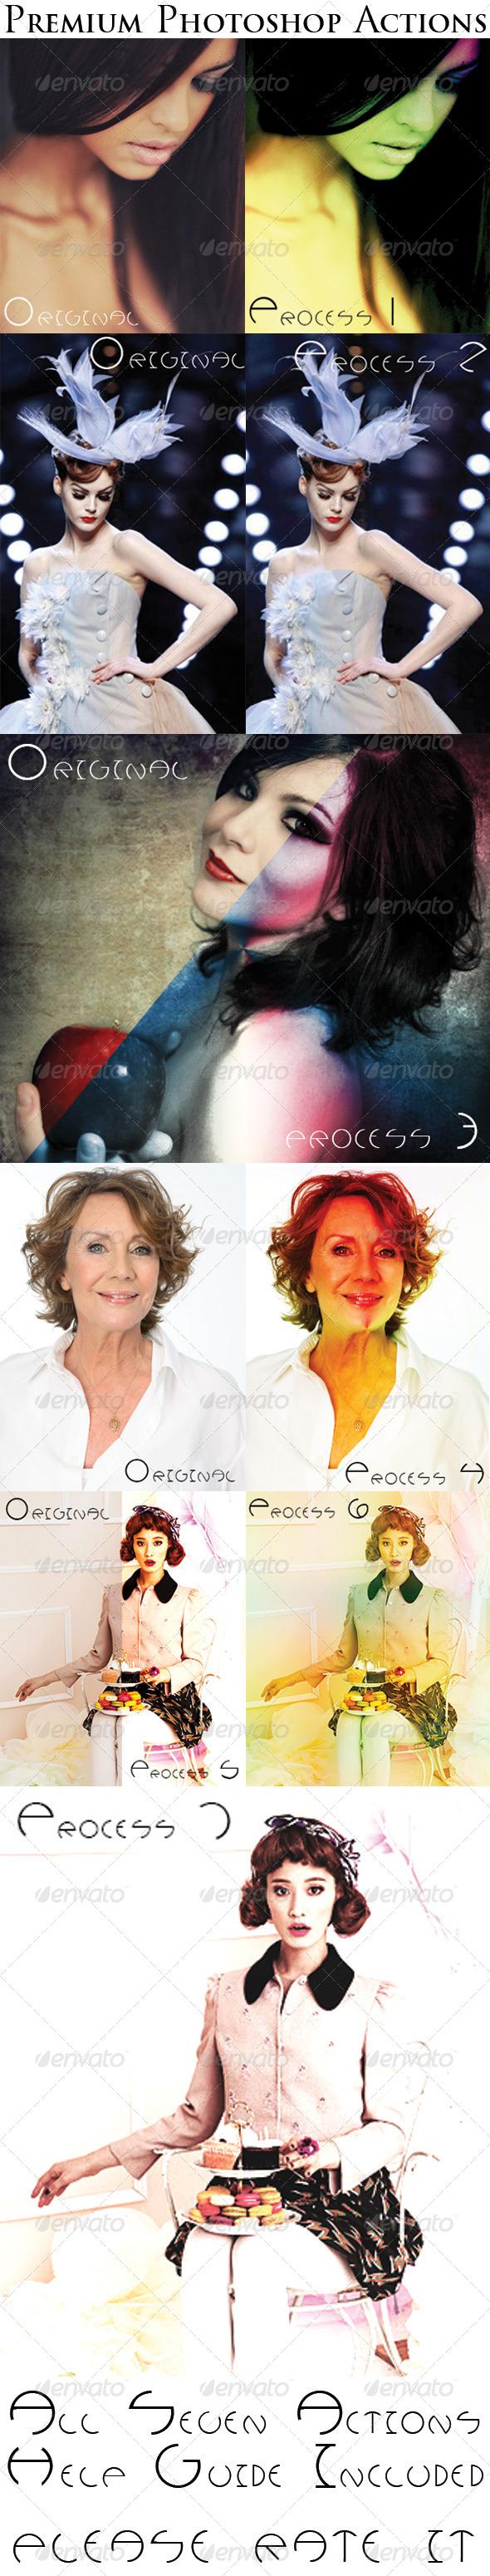 GraphicRiver Premium Photoshop Actions 5477511